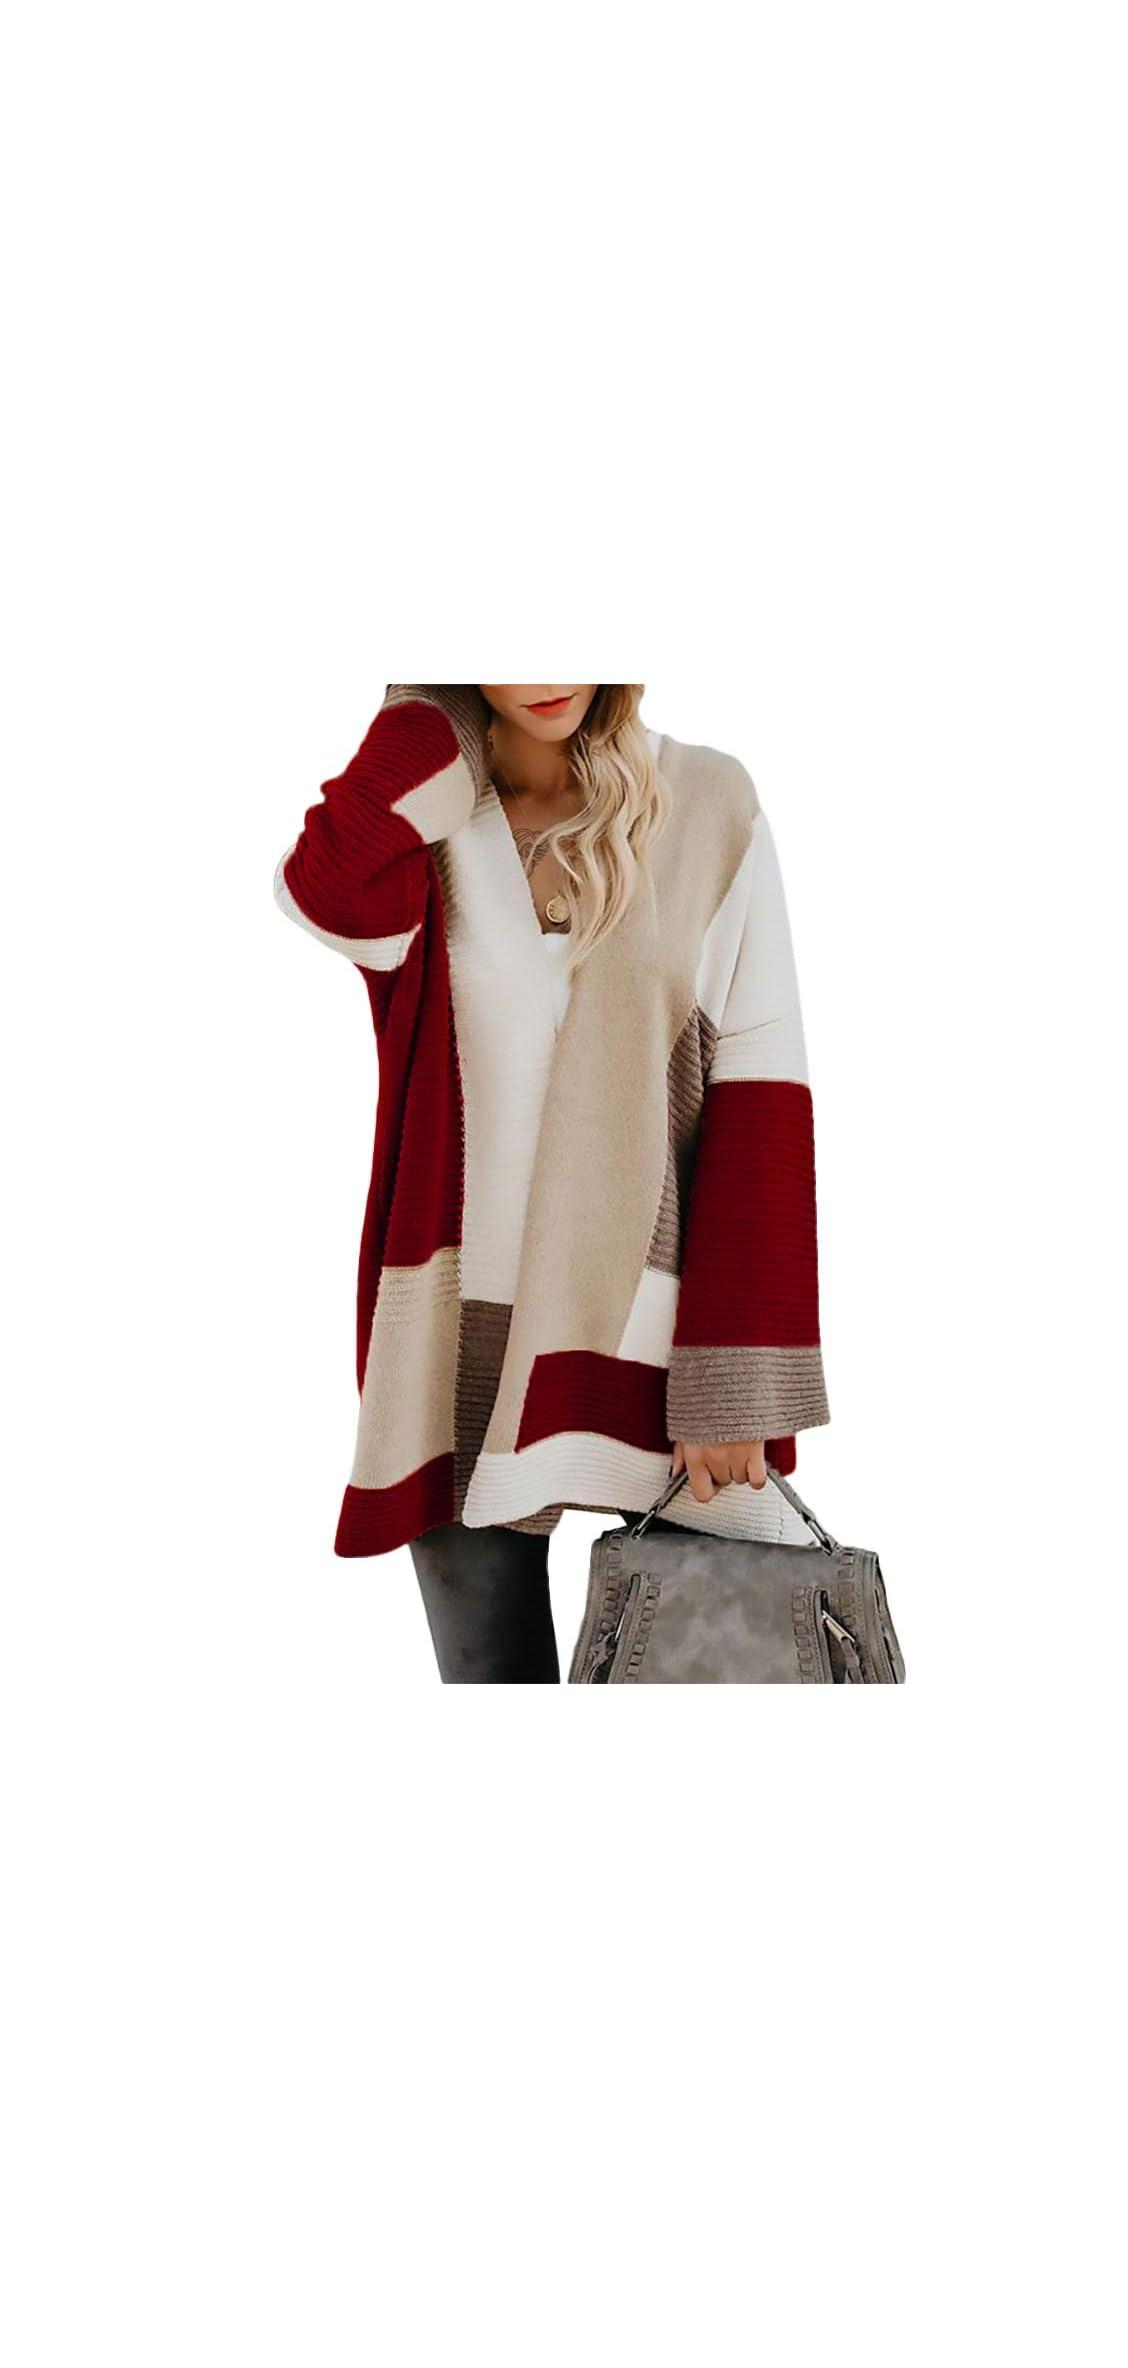 Women Sweater Cardigan Oversized Color Block Long Bell